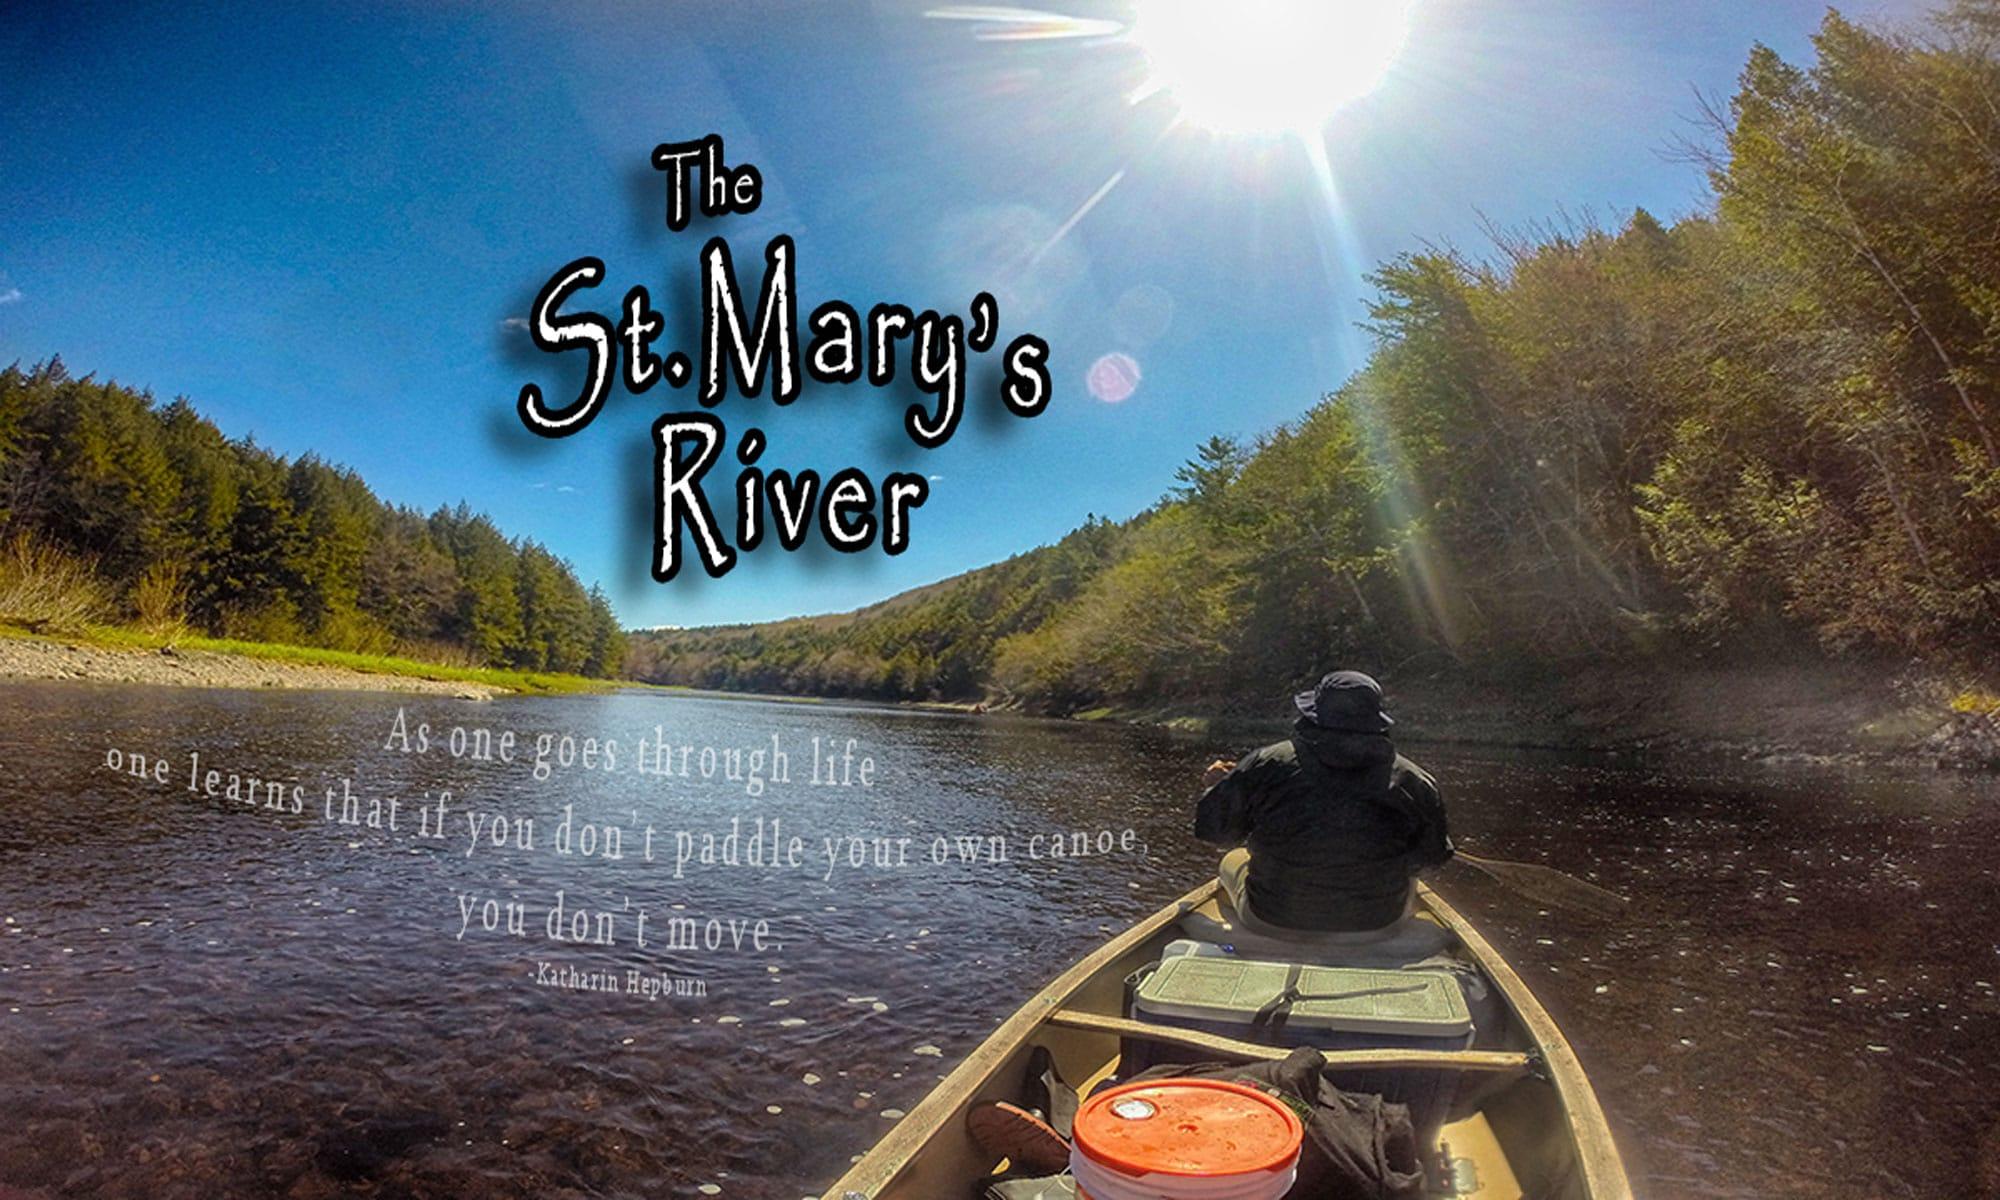 St. Mary's River - Nova Scotia